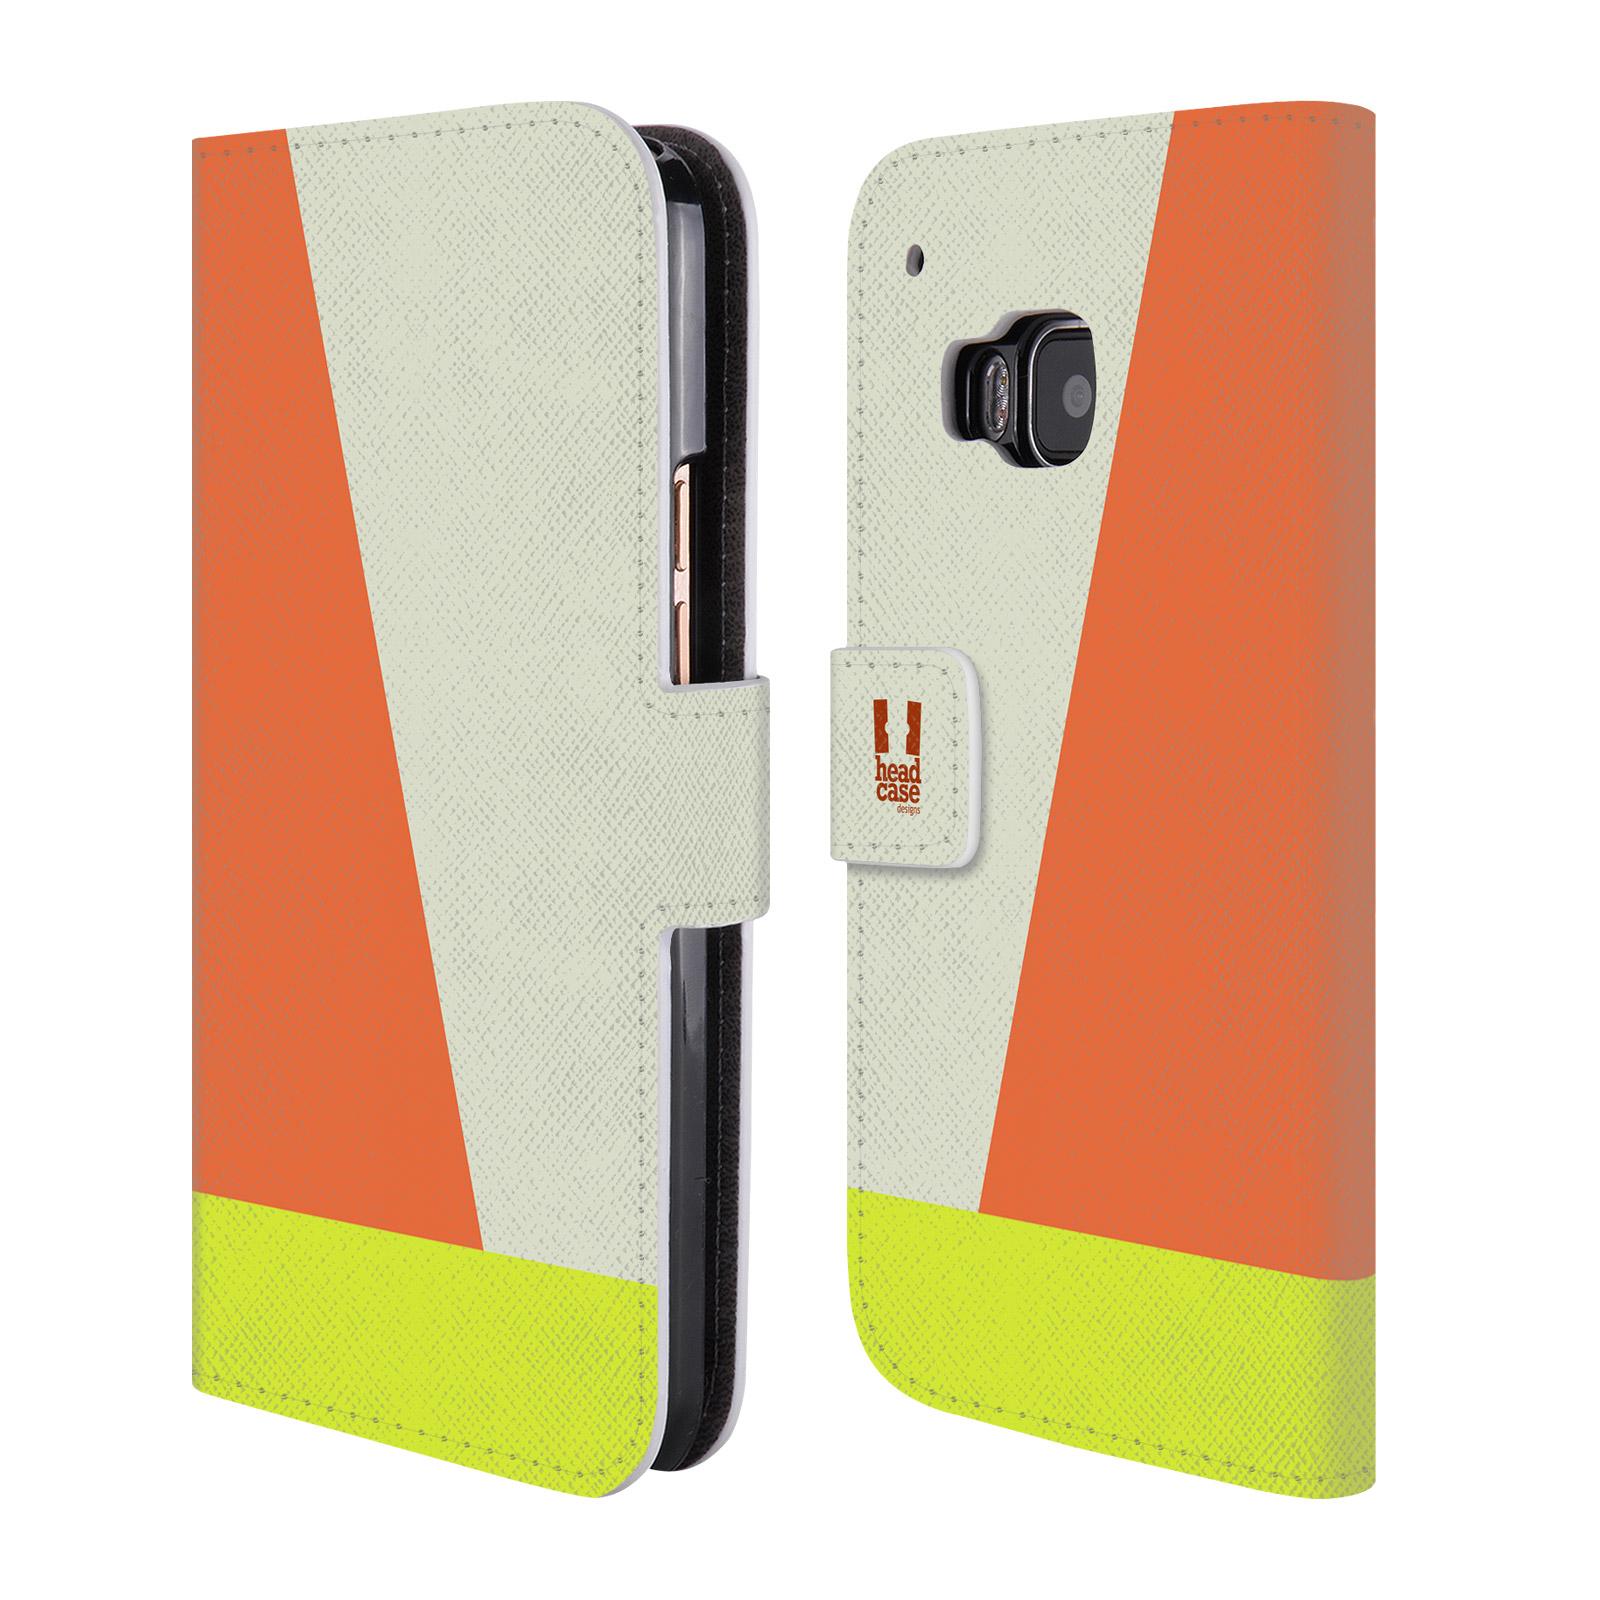 HEAD CASE Flipové pouzdro pro mobil HTC ONE M9 barevné tvary slonová kost